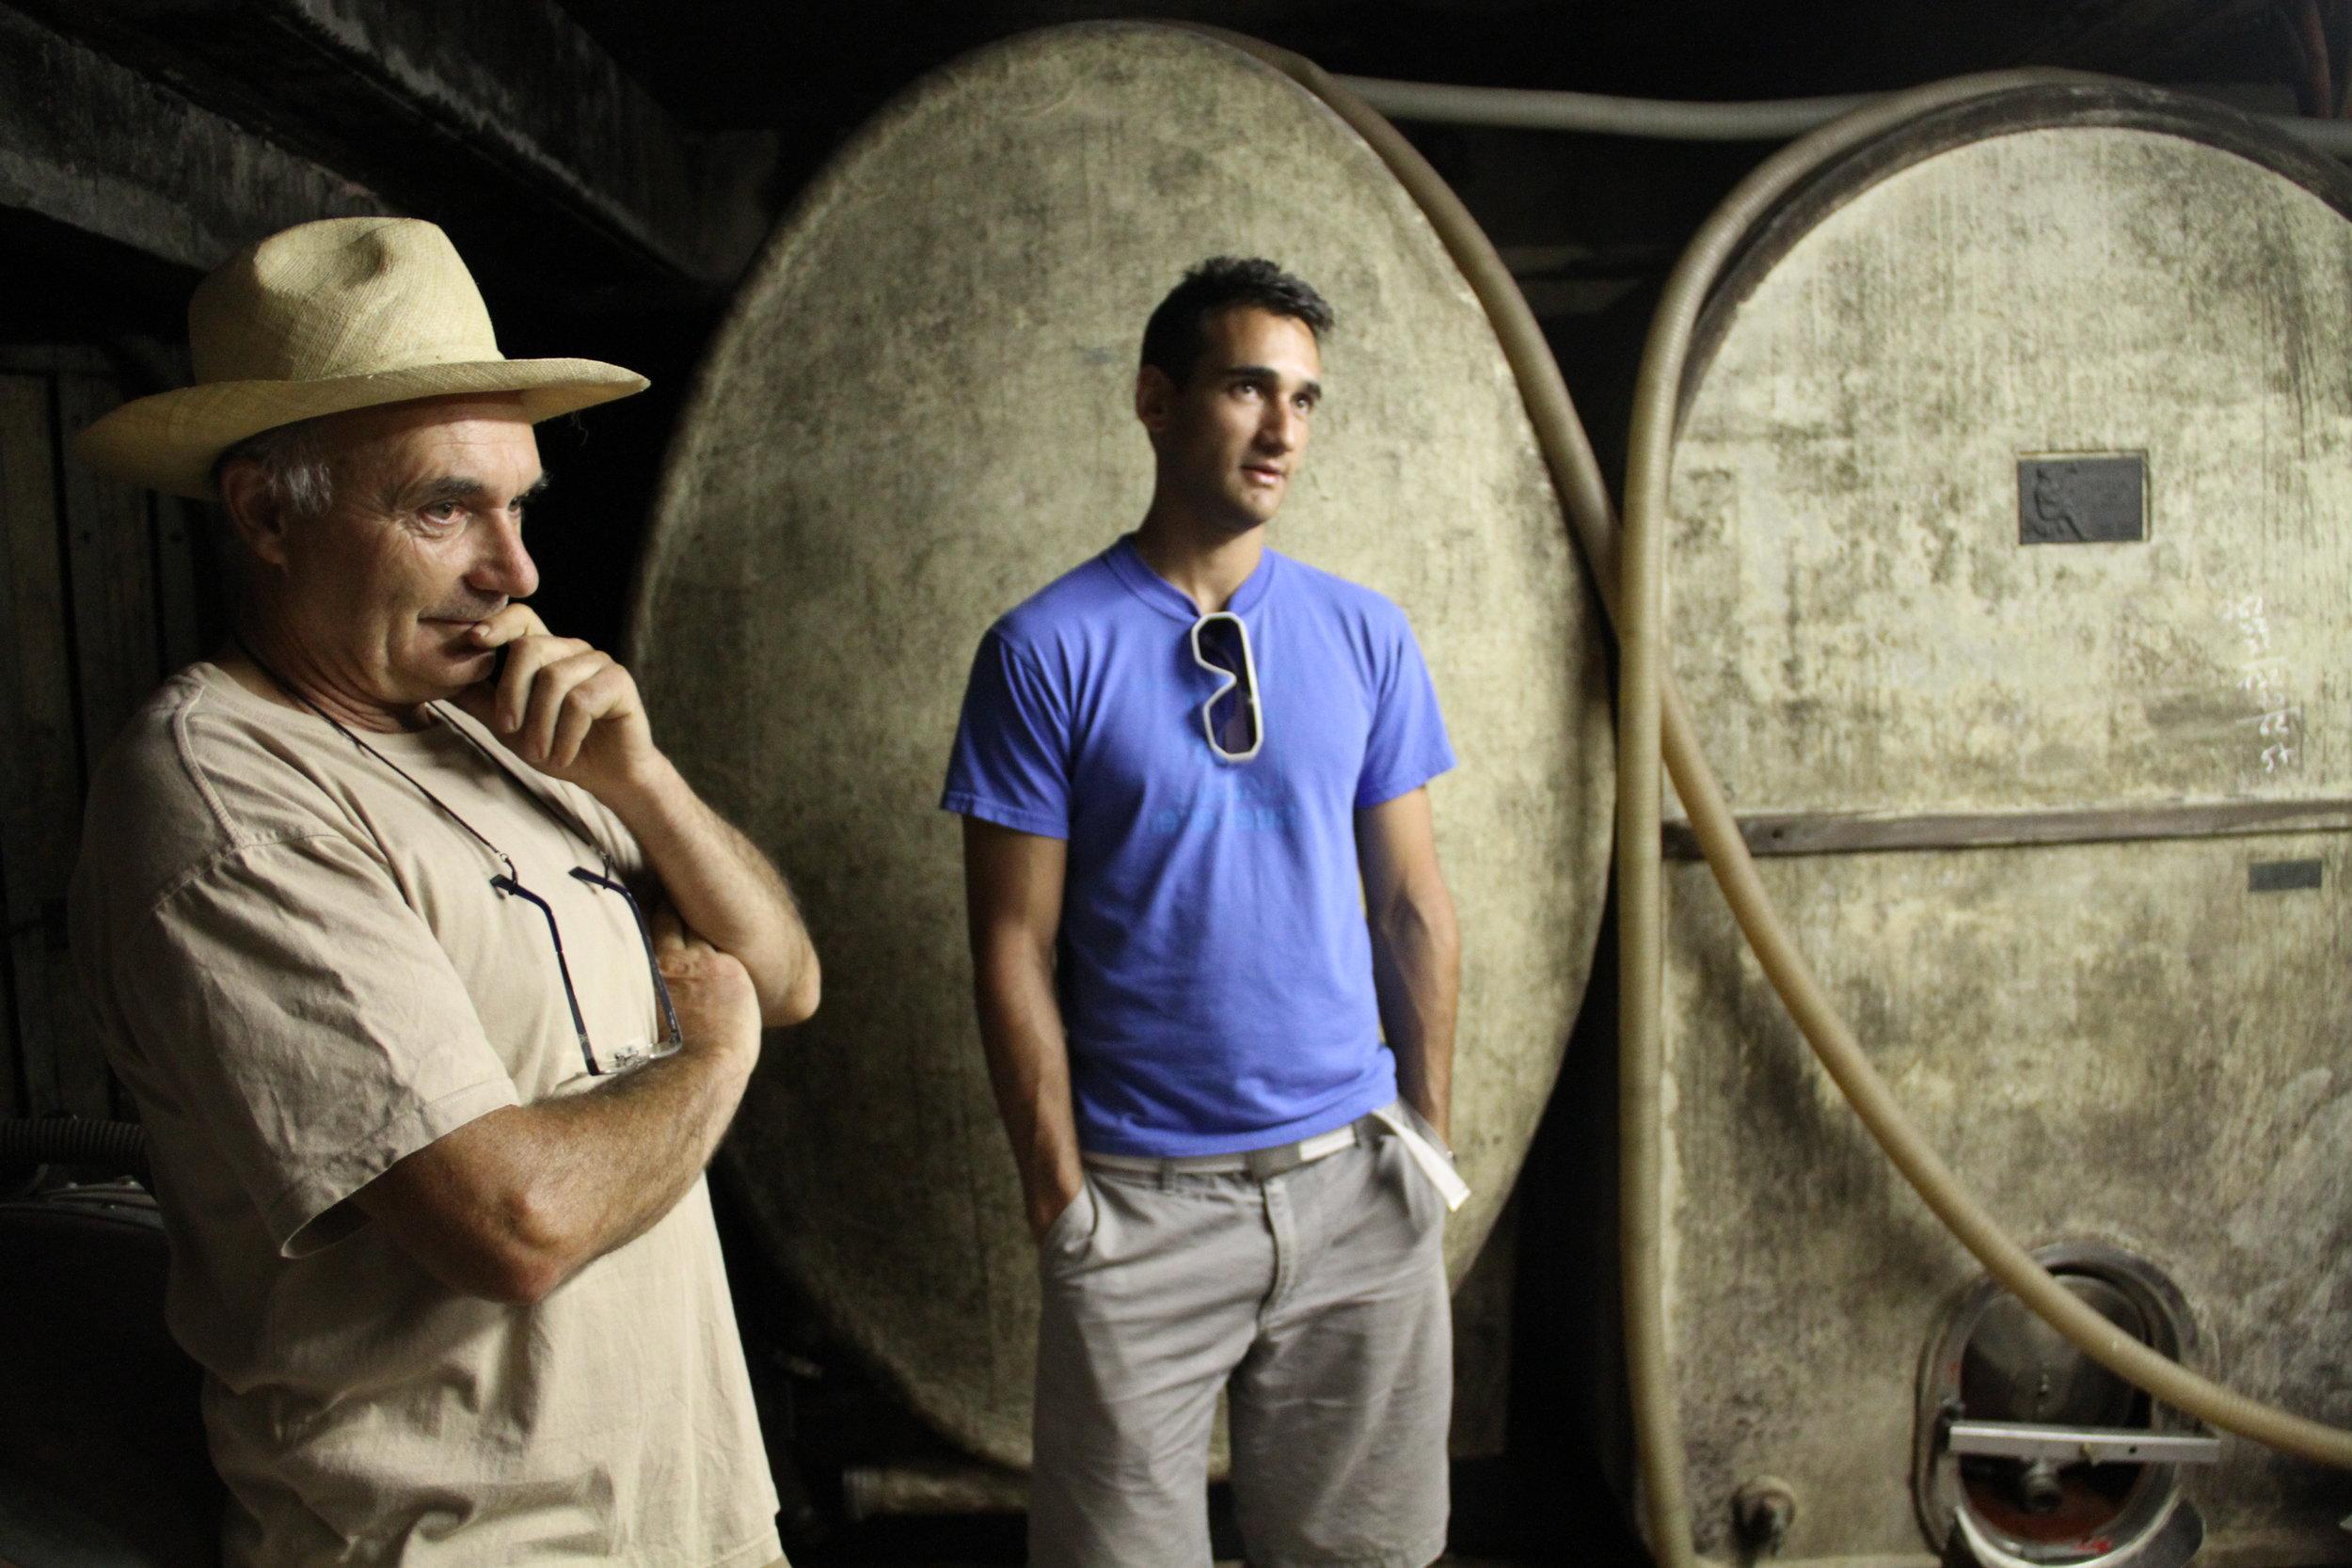 The wine process, 2012.